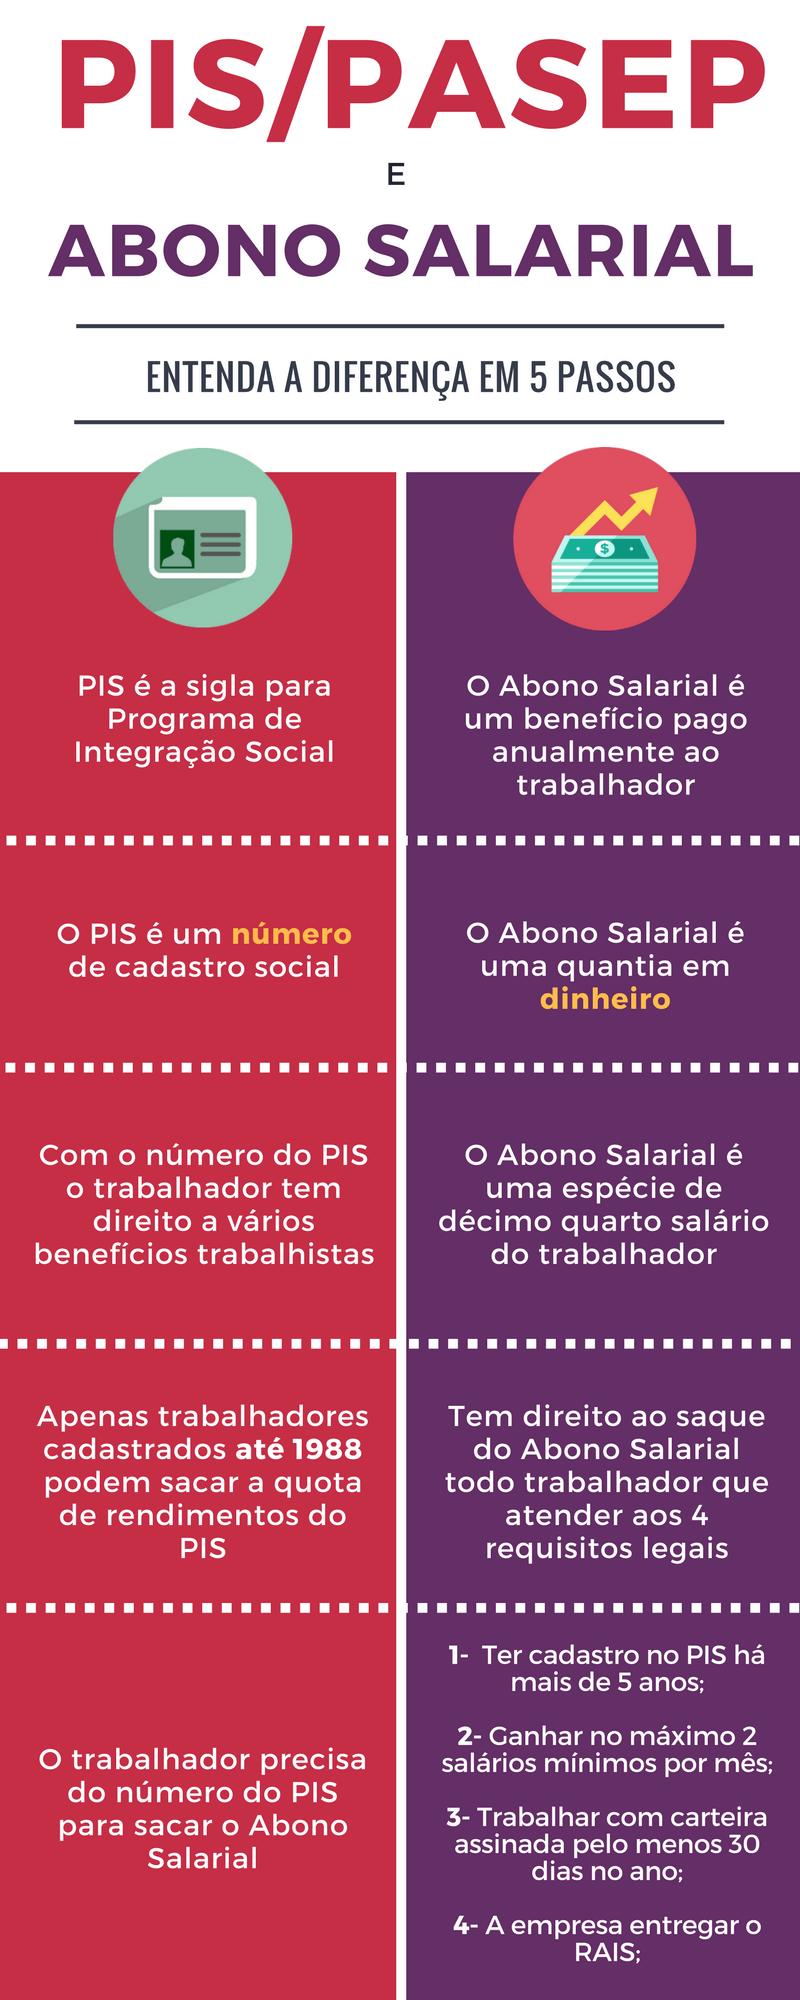 pis-pasep-abono-salarial-diferenca-infografico